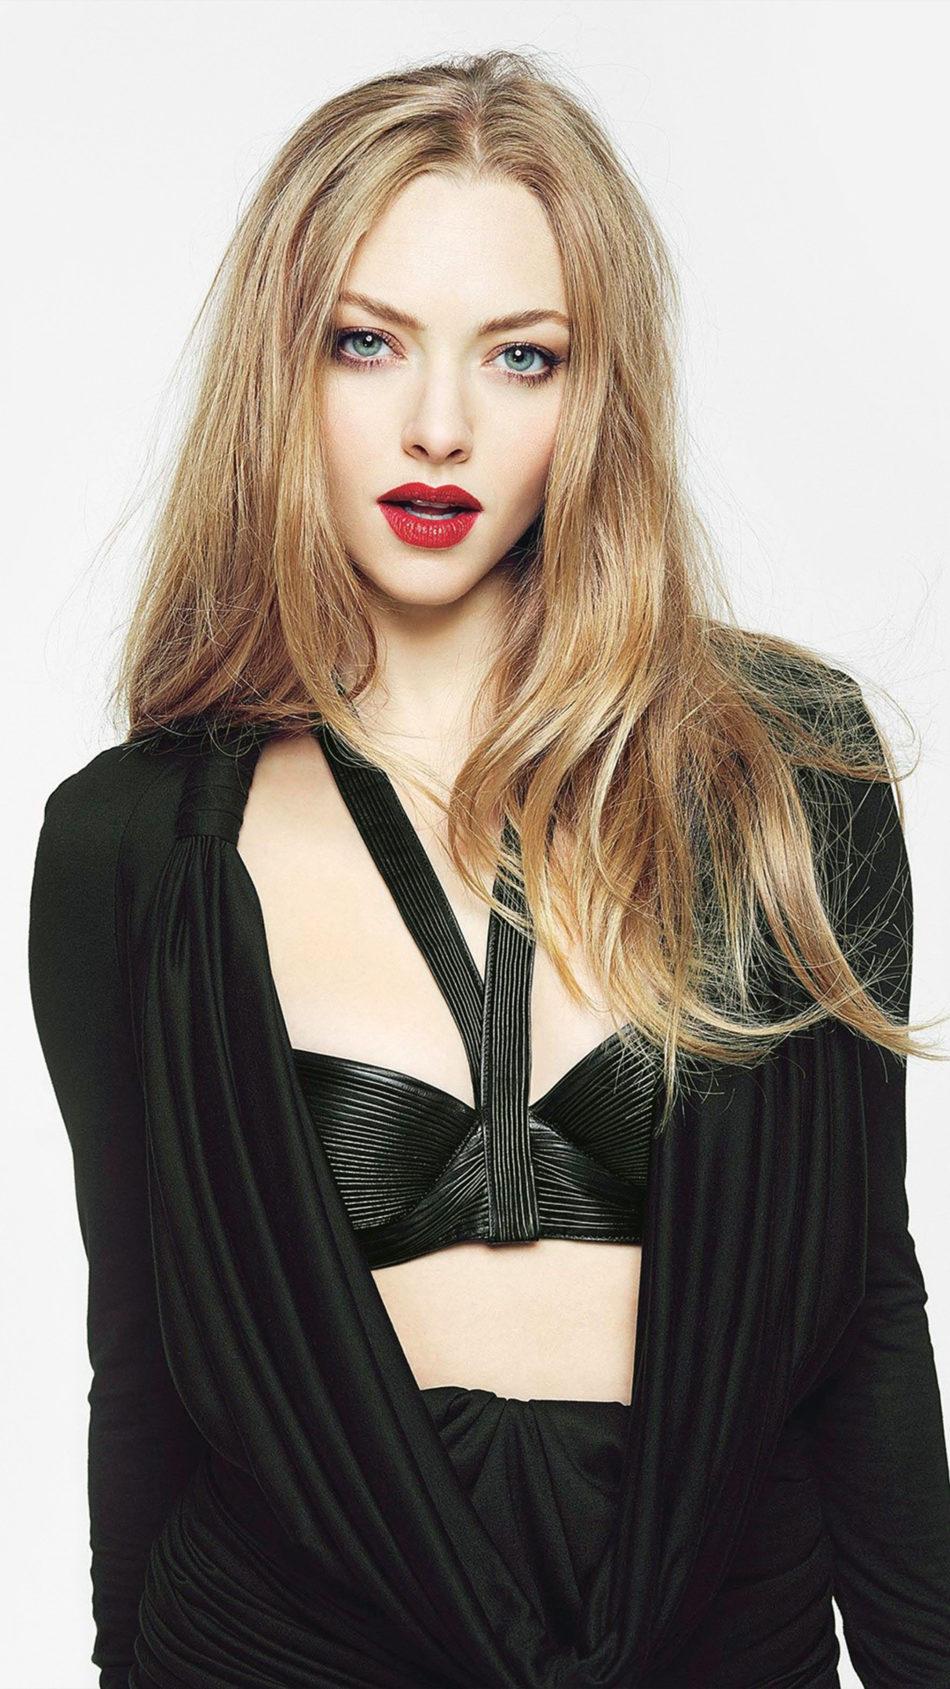 Amanda Seyfried In Black Dress Photoshoot 2021 4K Ultra HD Mobile Wallpaper